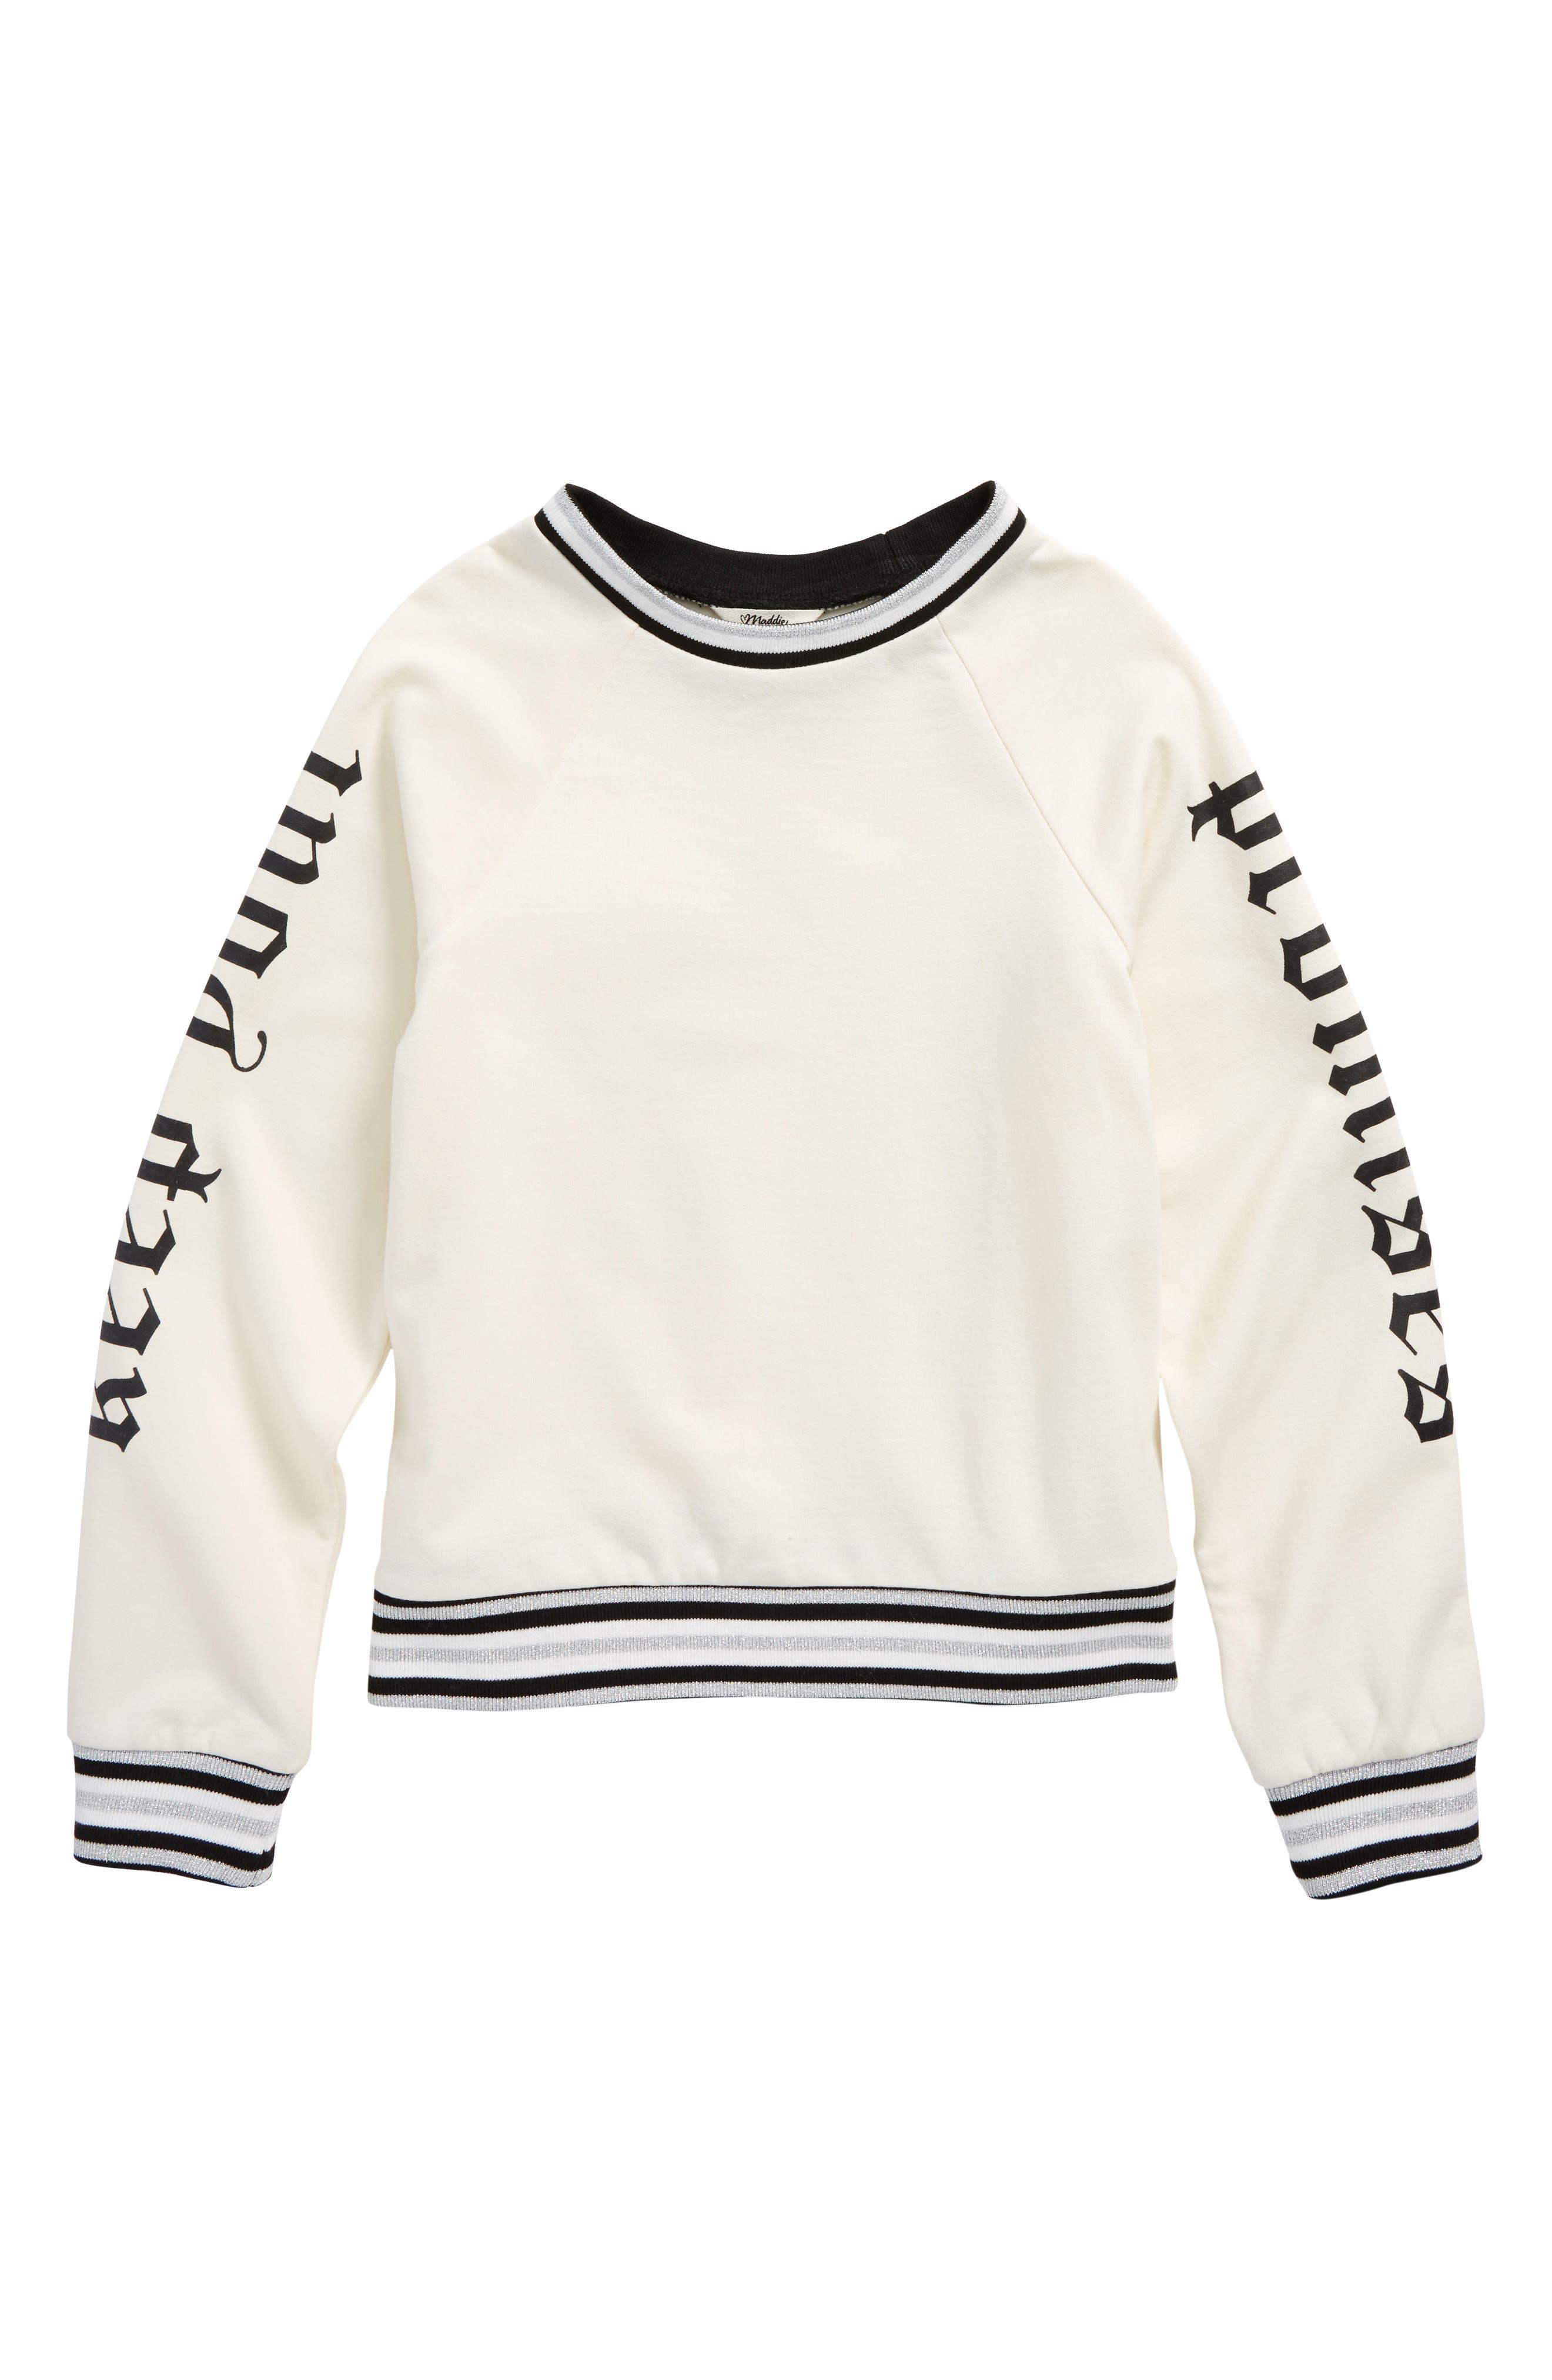 Main Image - Maddie Keep Your Promises Graphic Sweatshirt (Big Girls)